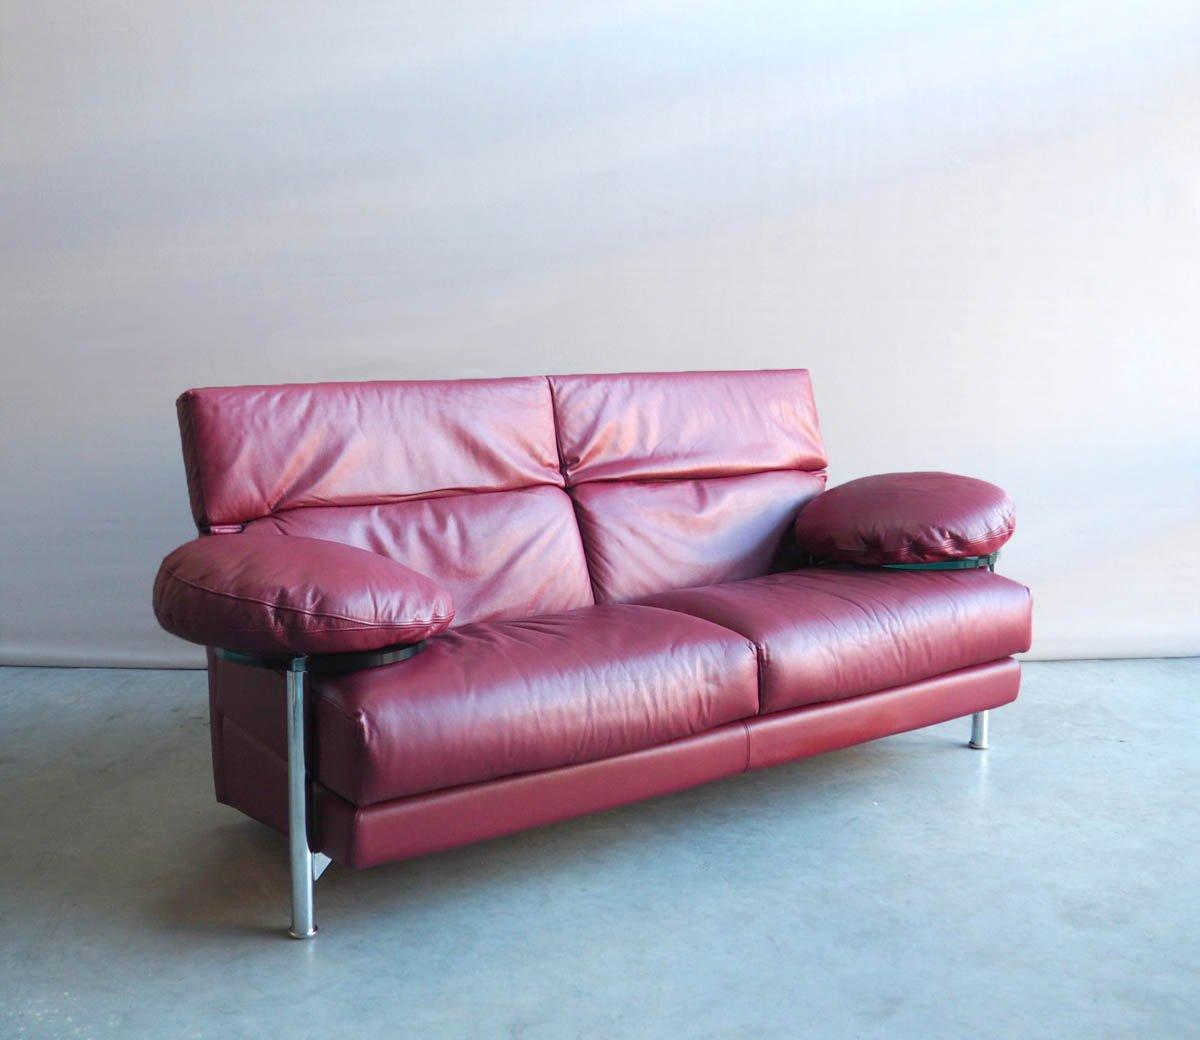 rotes vintage arca ledersofa von paolo piva f r b b italia bei pamono kaufen. Black Bedroom Furniture Sets. Home Design Ideas